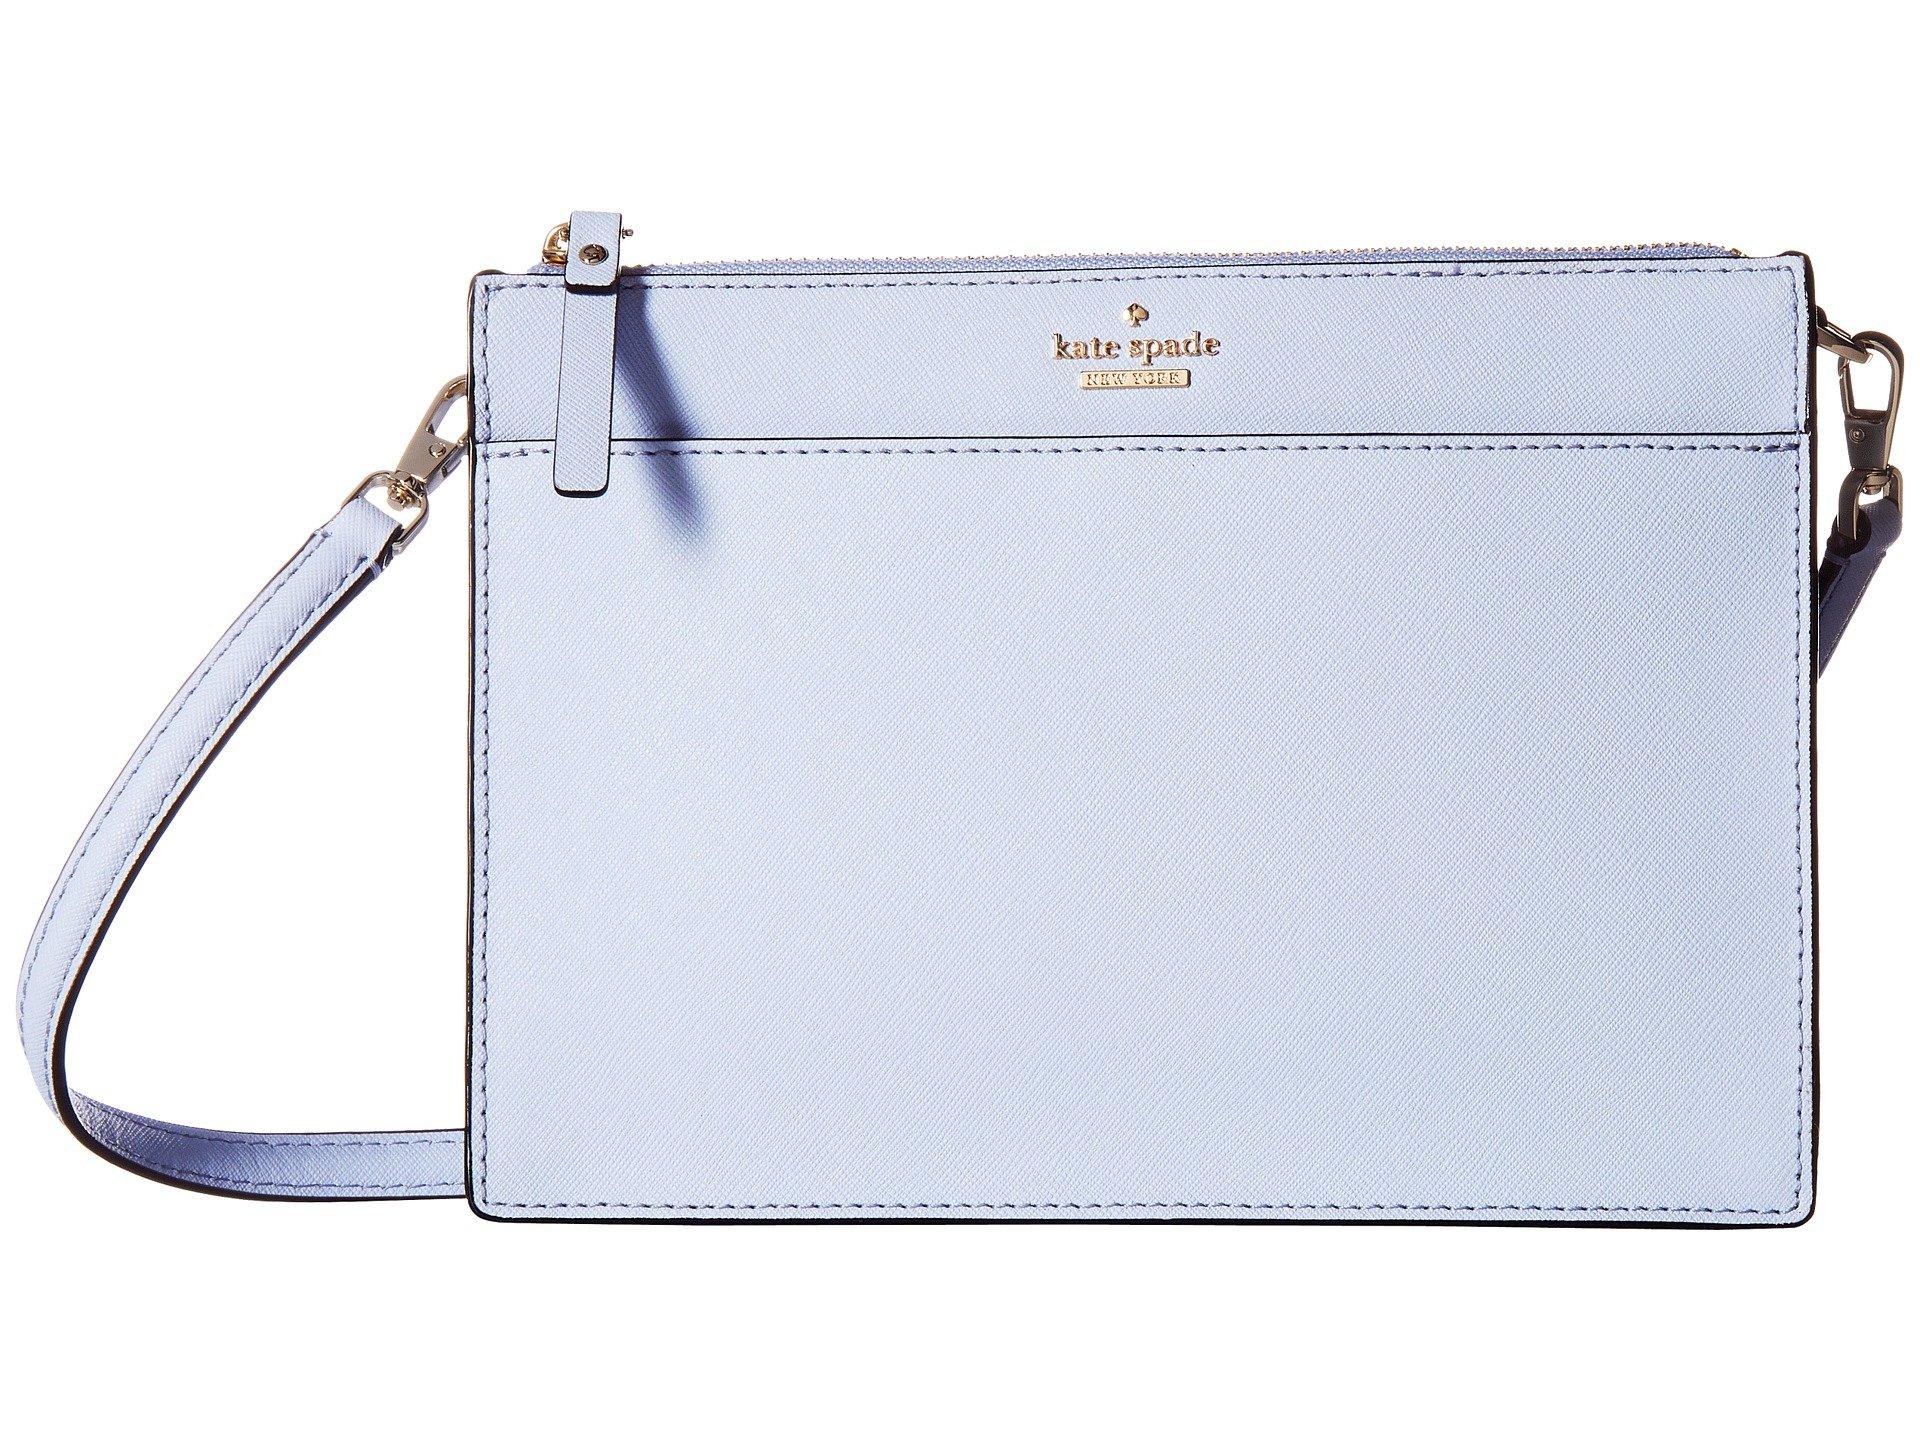 New Kate Spade New York Cameron Street Clarise Handbags, Morning Dawn